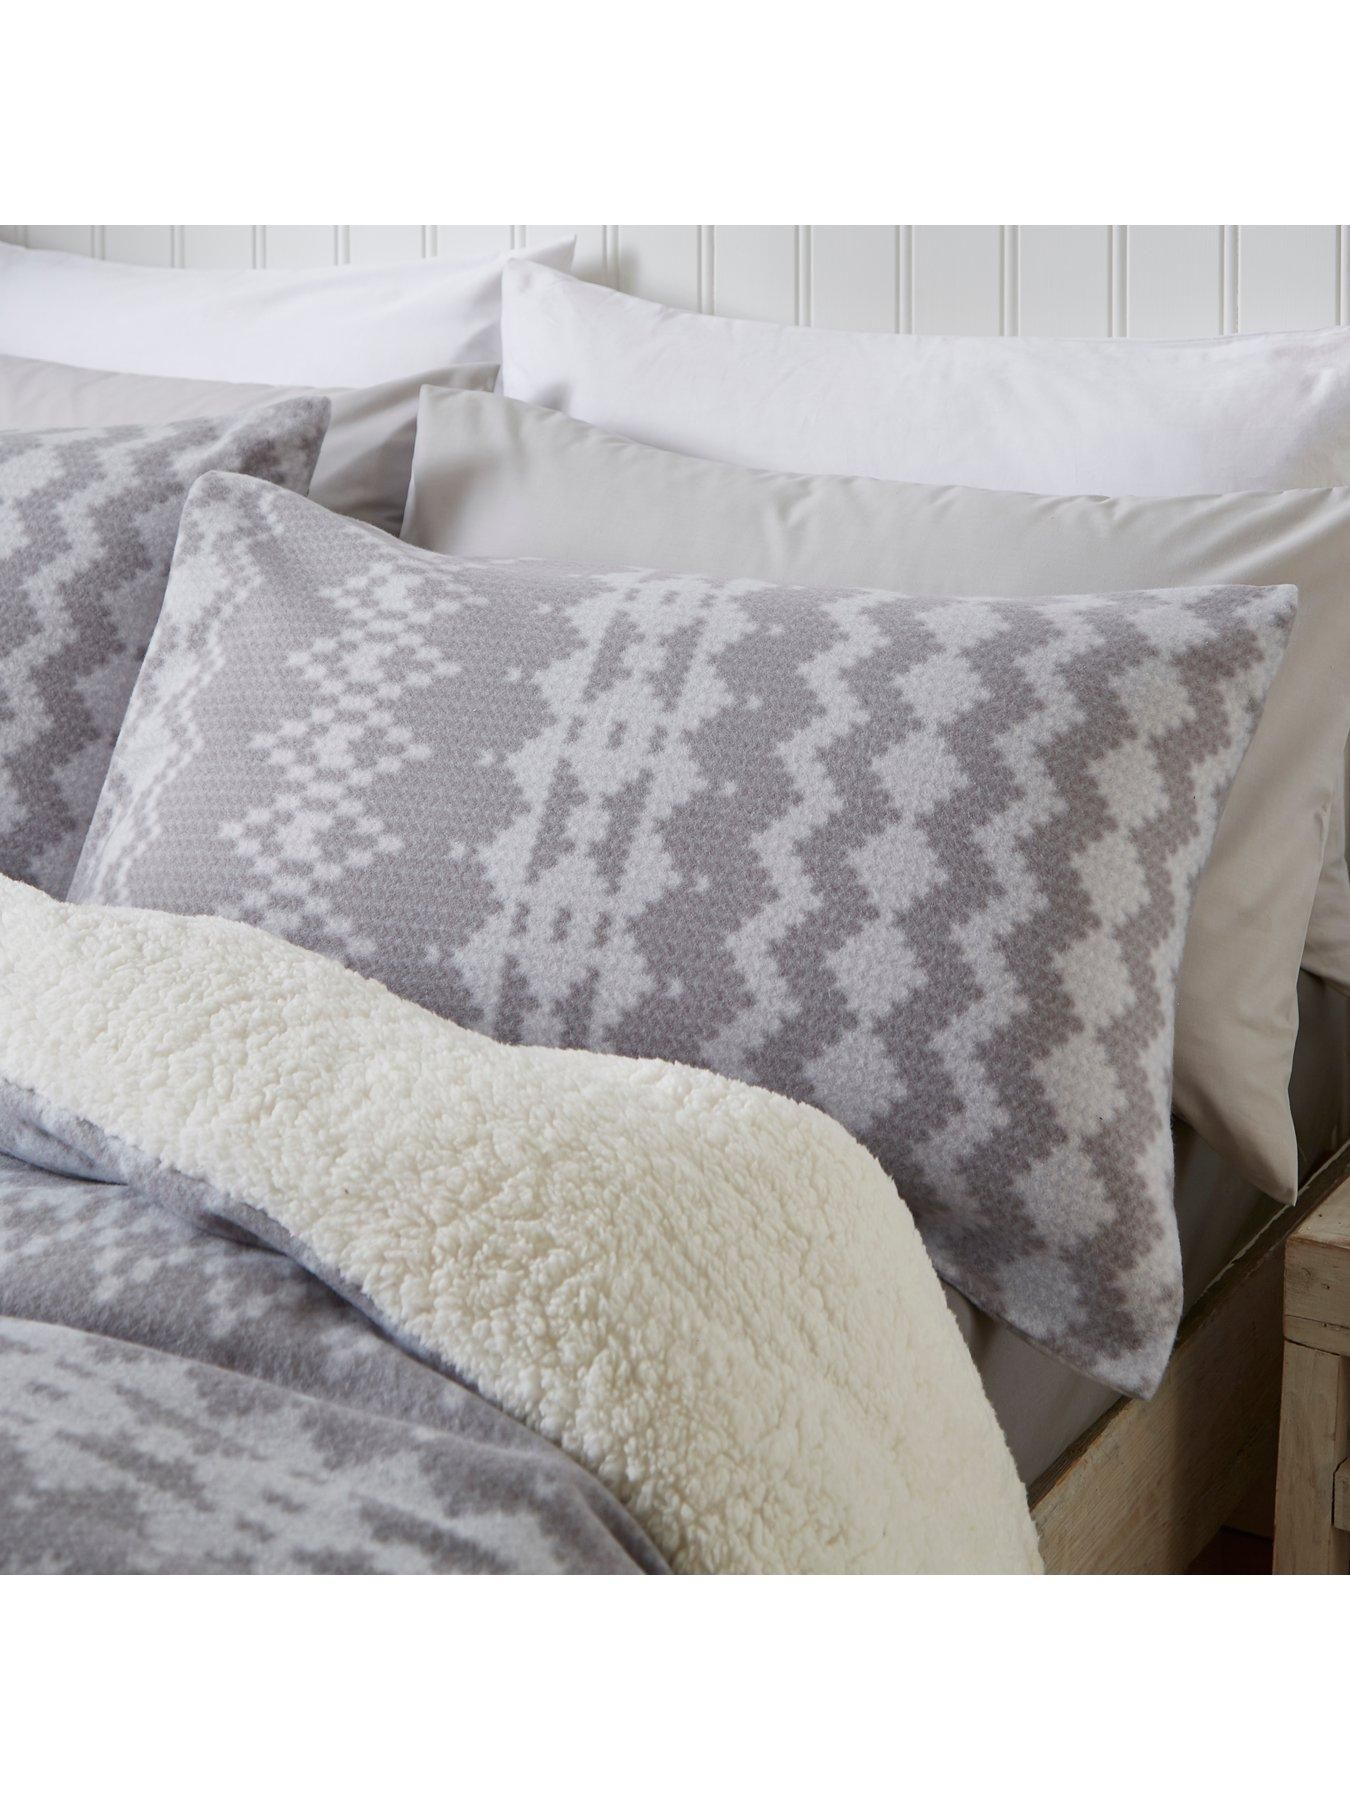 Catherine lansfield alpine fleece duvet cover set with